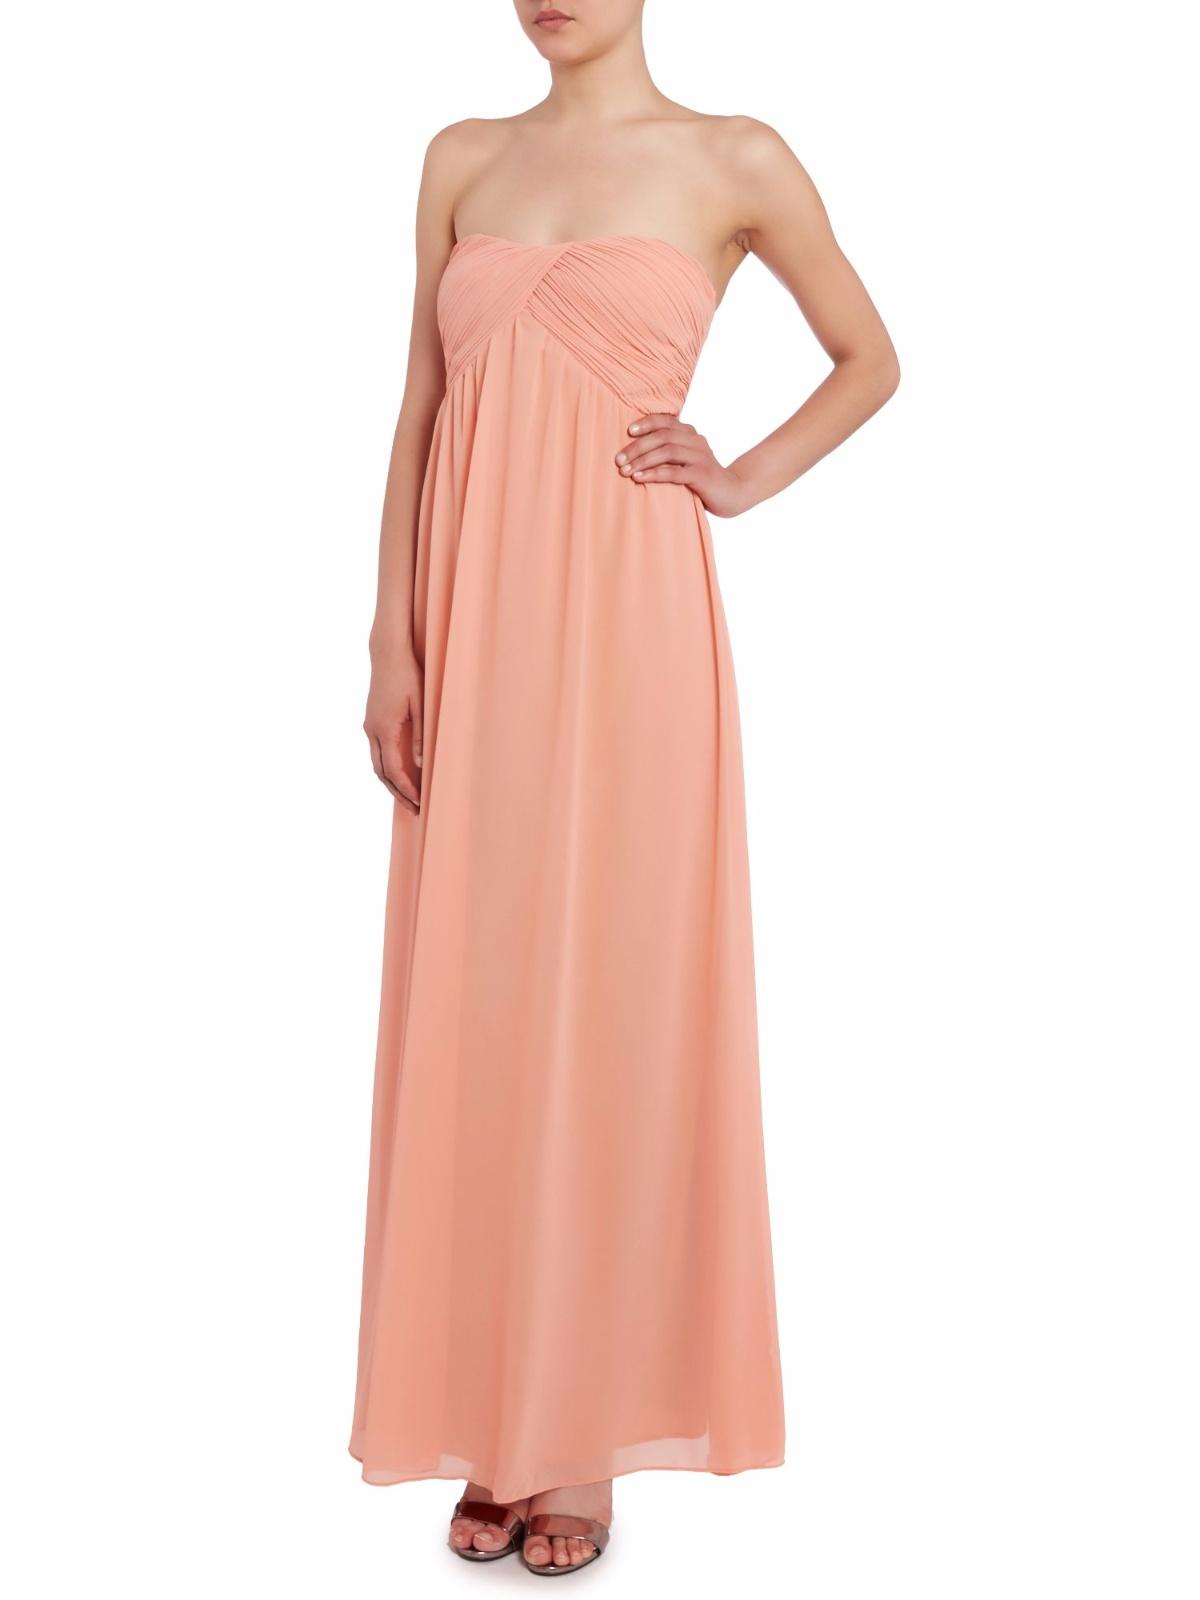 TRUE DECADENCE koralowa maxi sukienka 42 XL